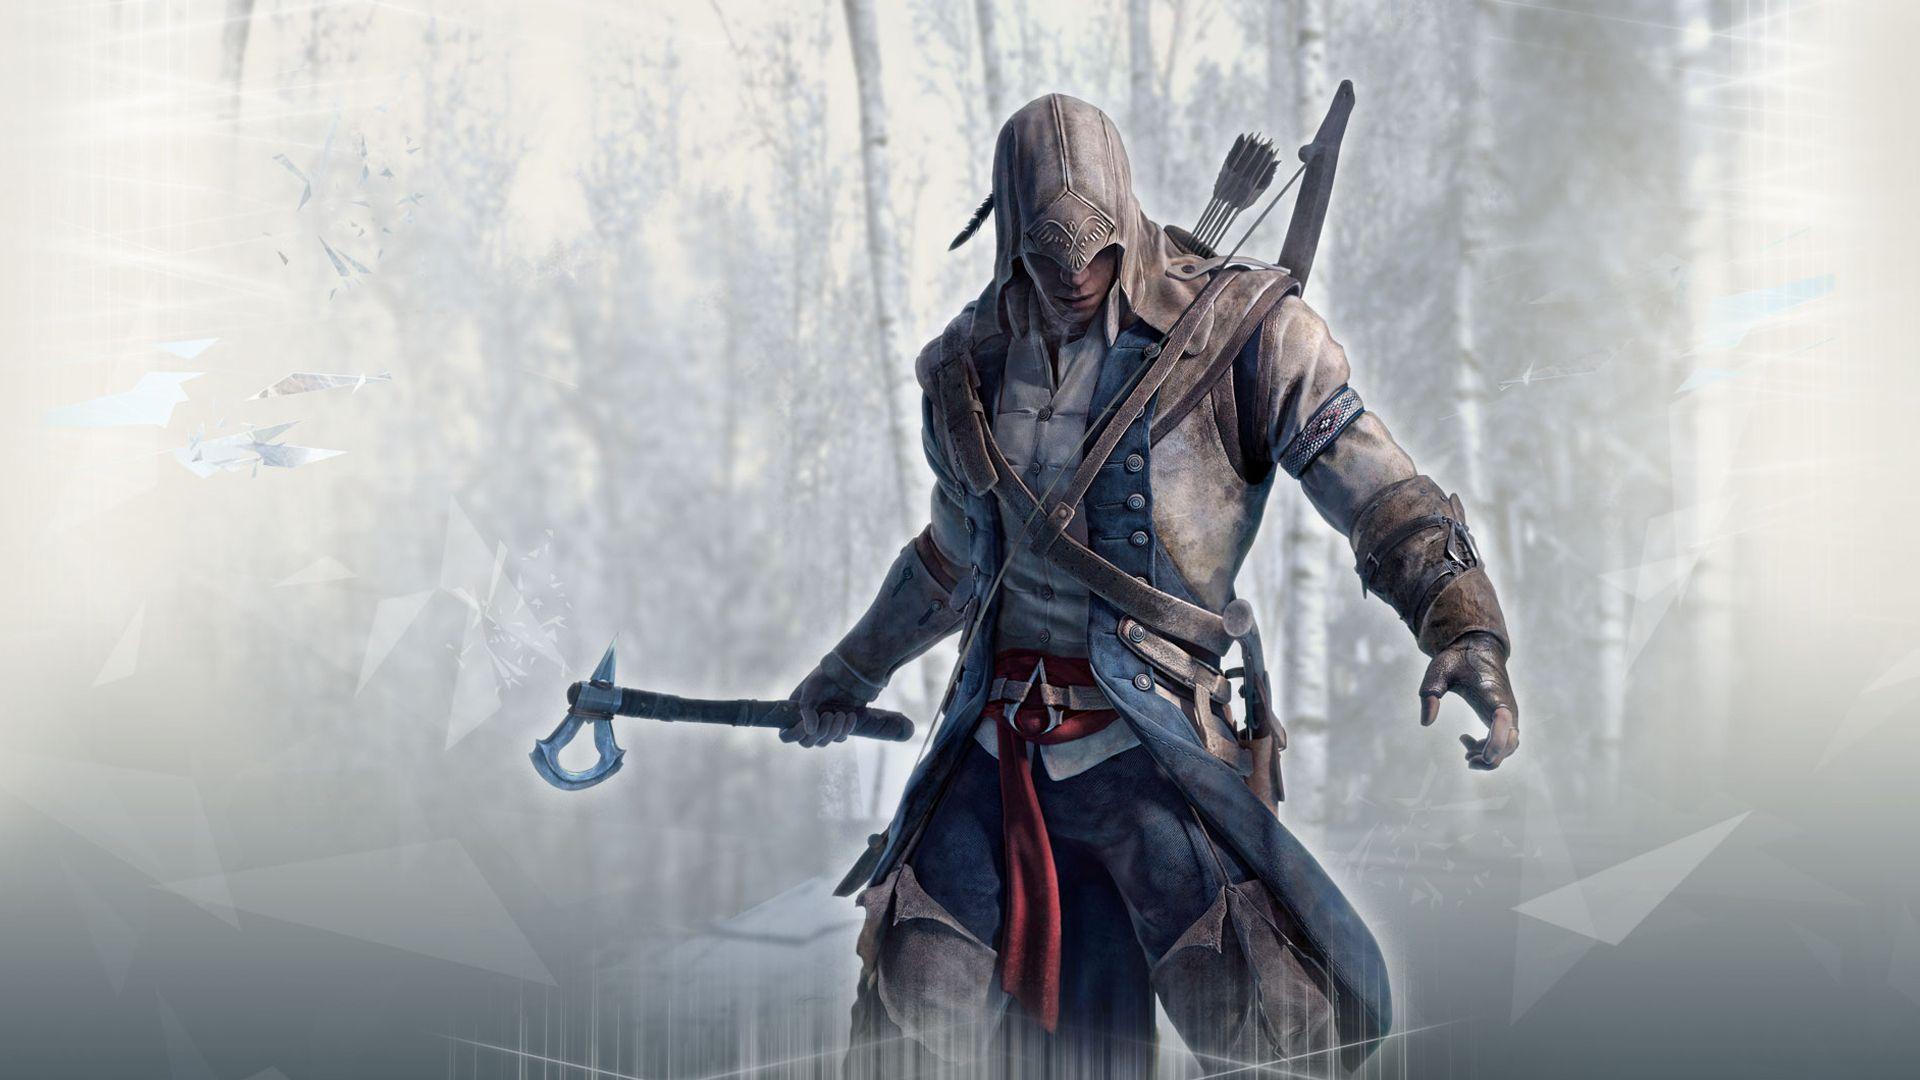 Ac3 Wallpaper Hd 1080p Assassin S Creed Wallpaper Assassins